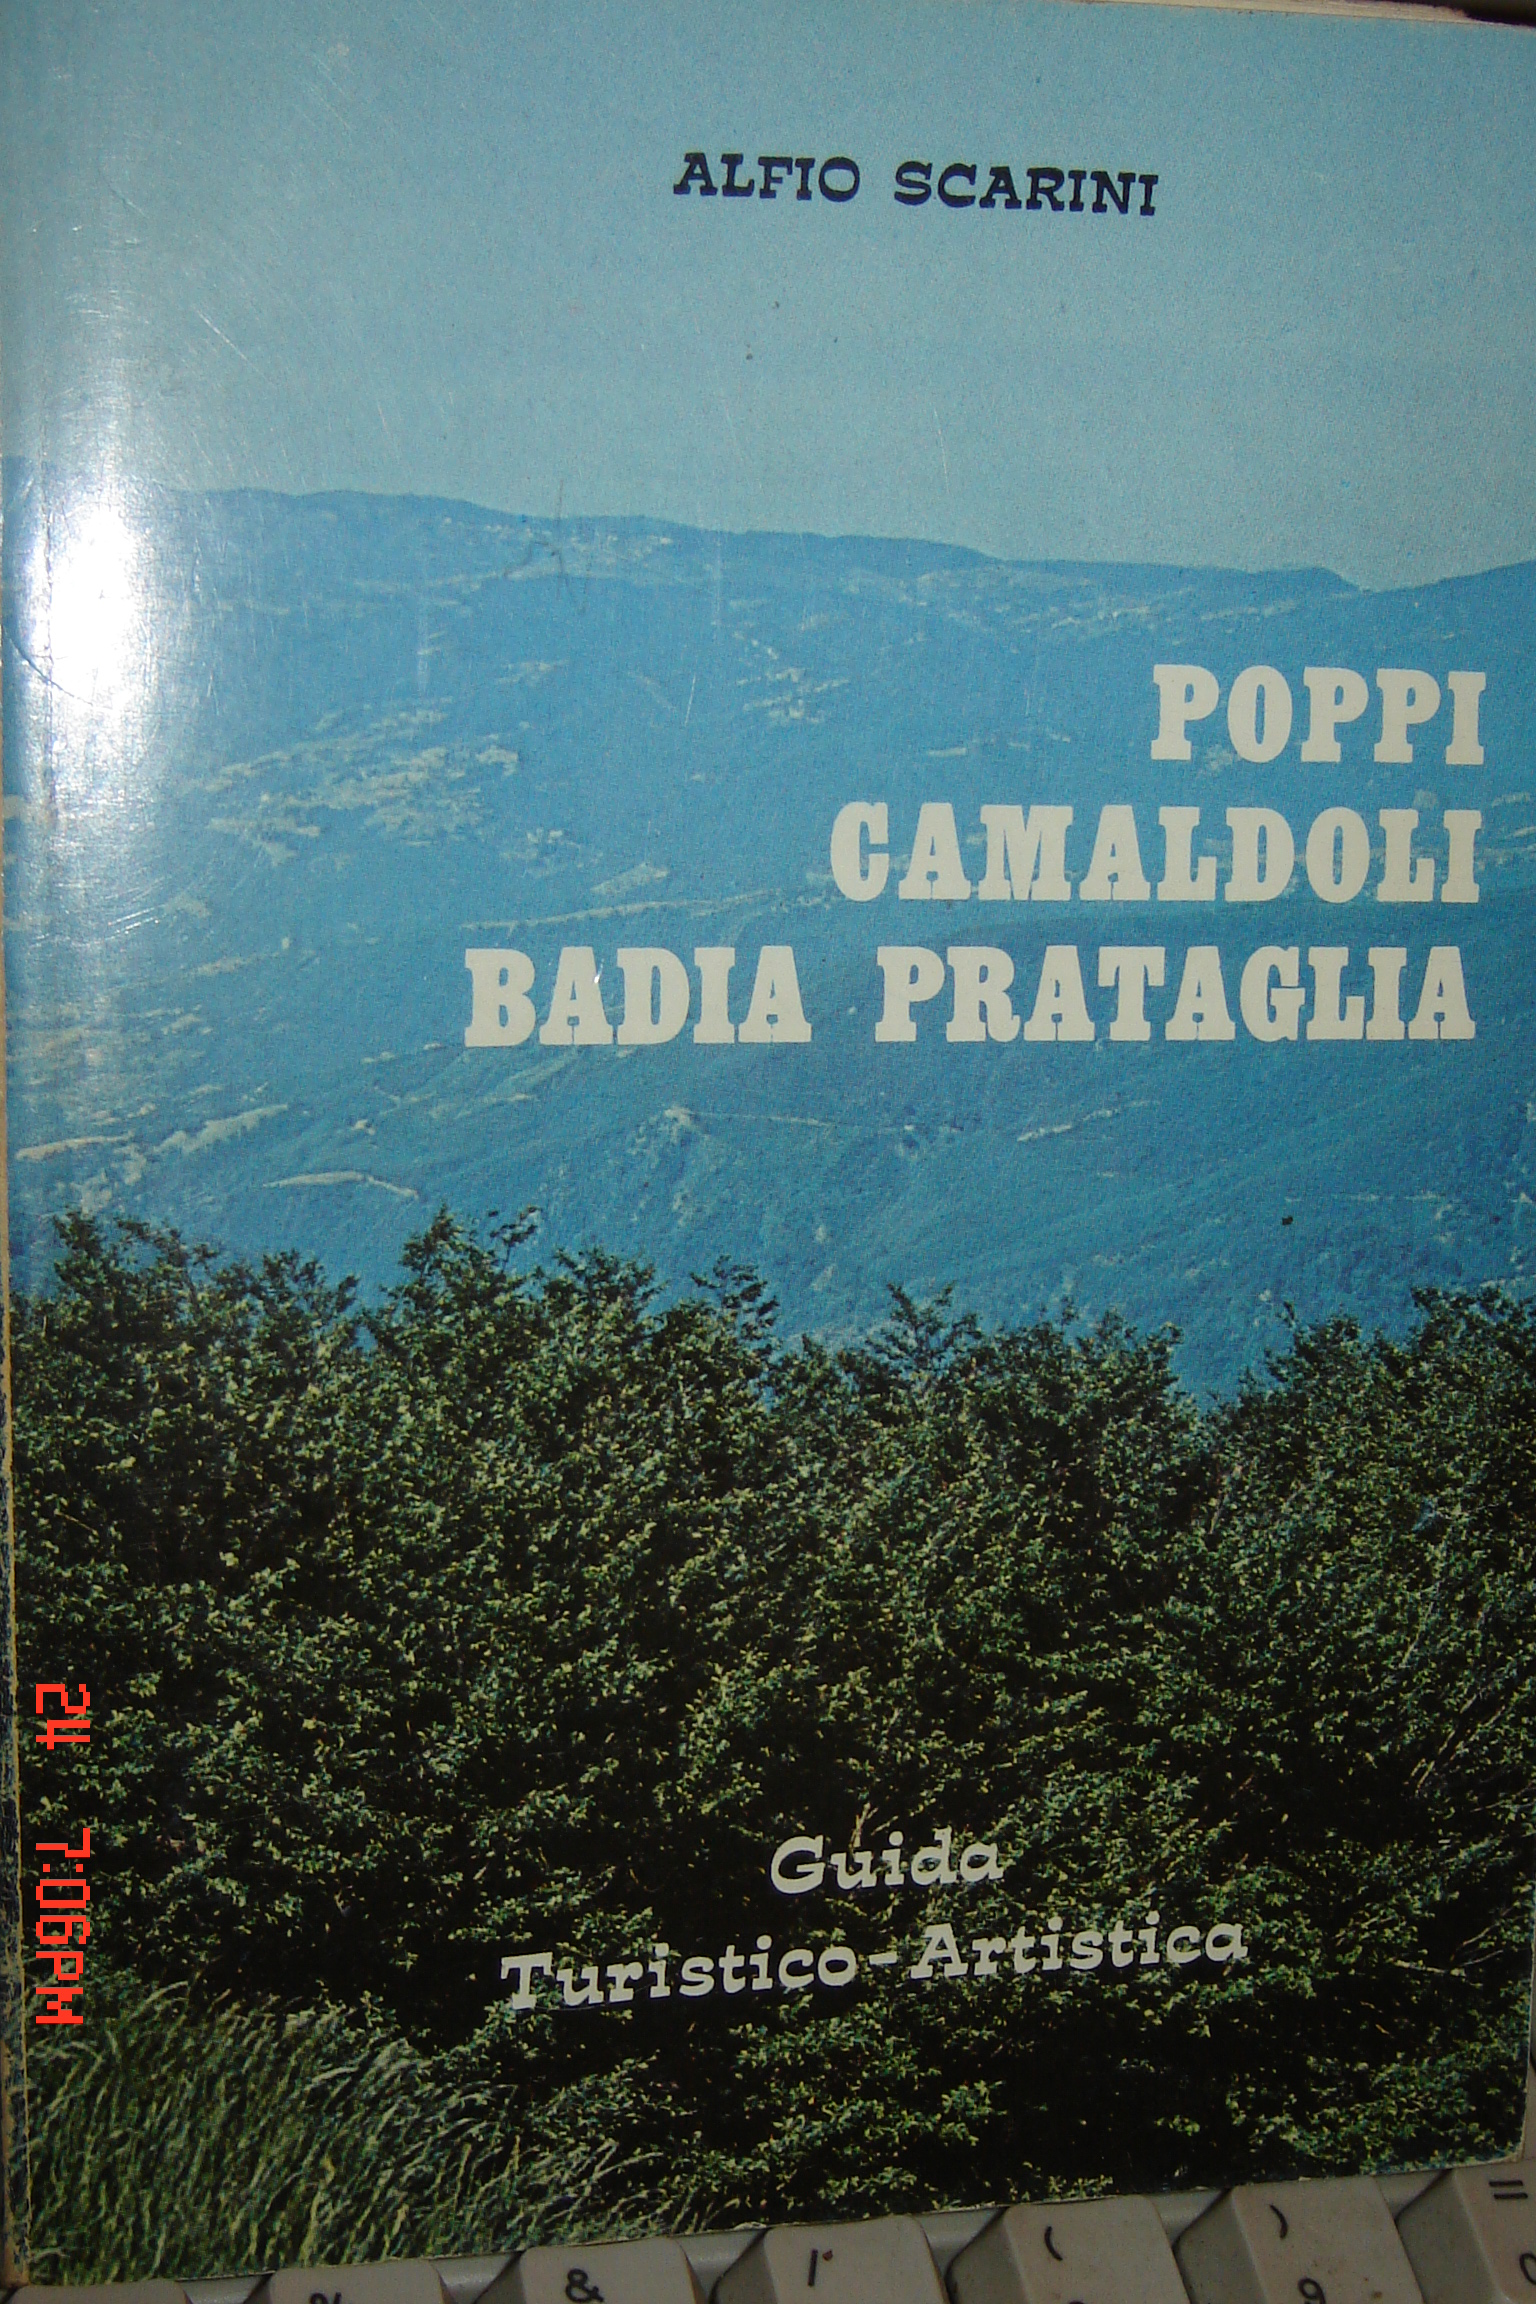 Poppi Camaldoli Badia Prataglia